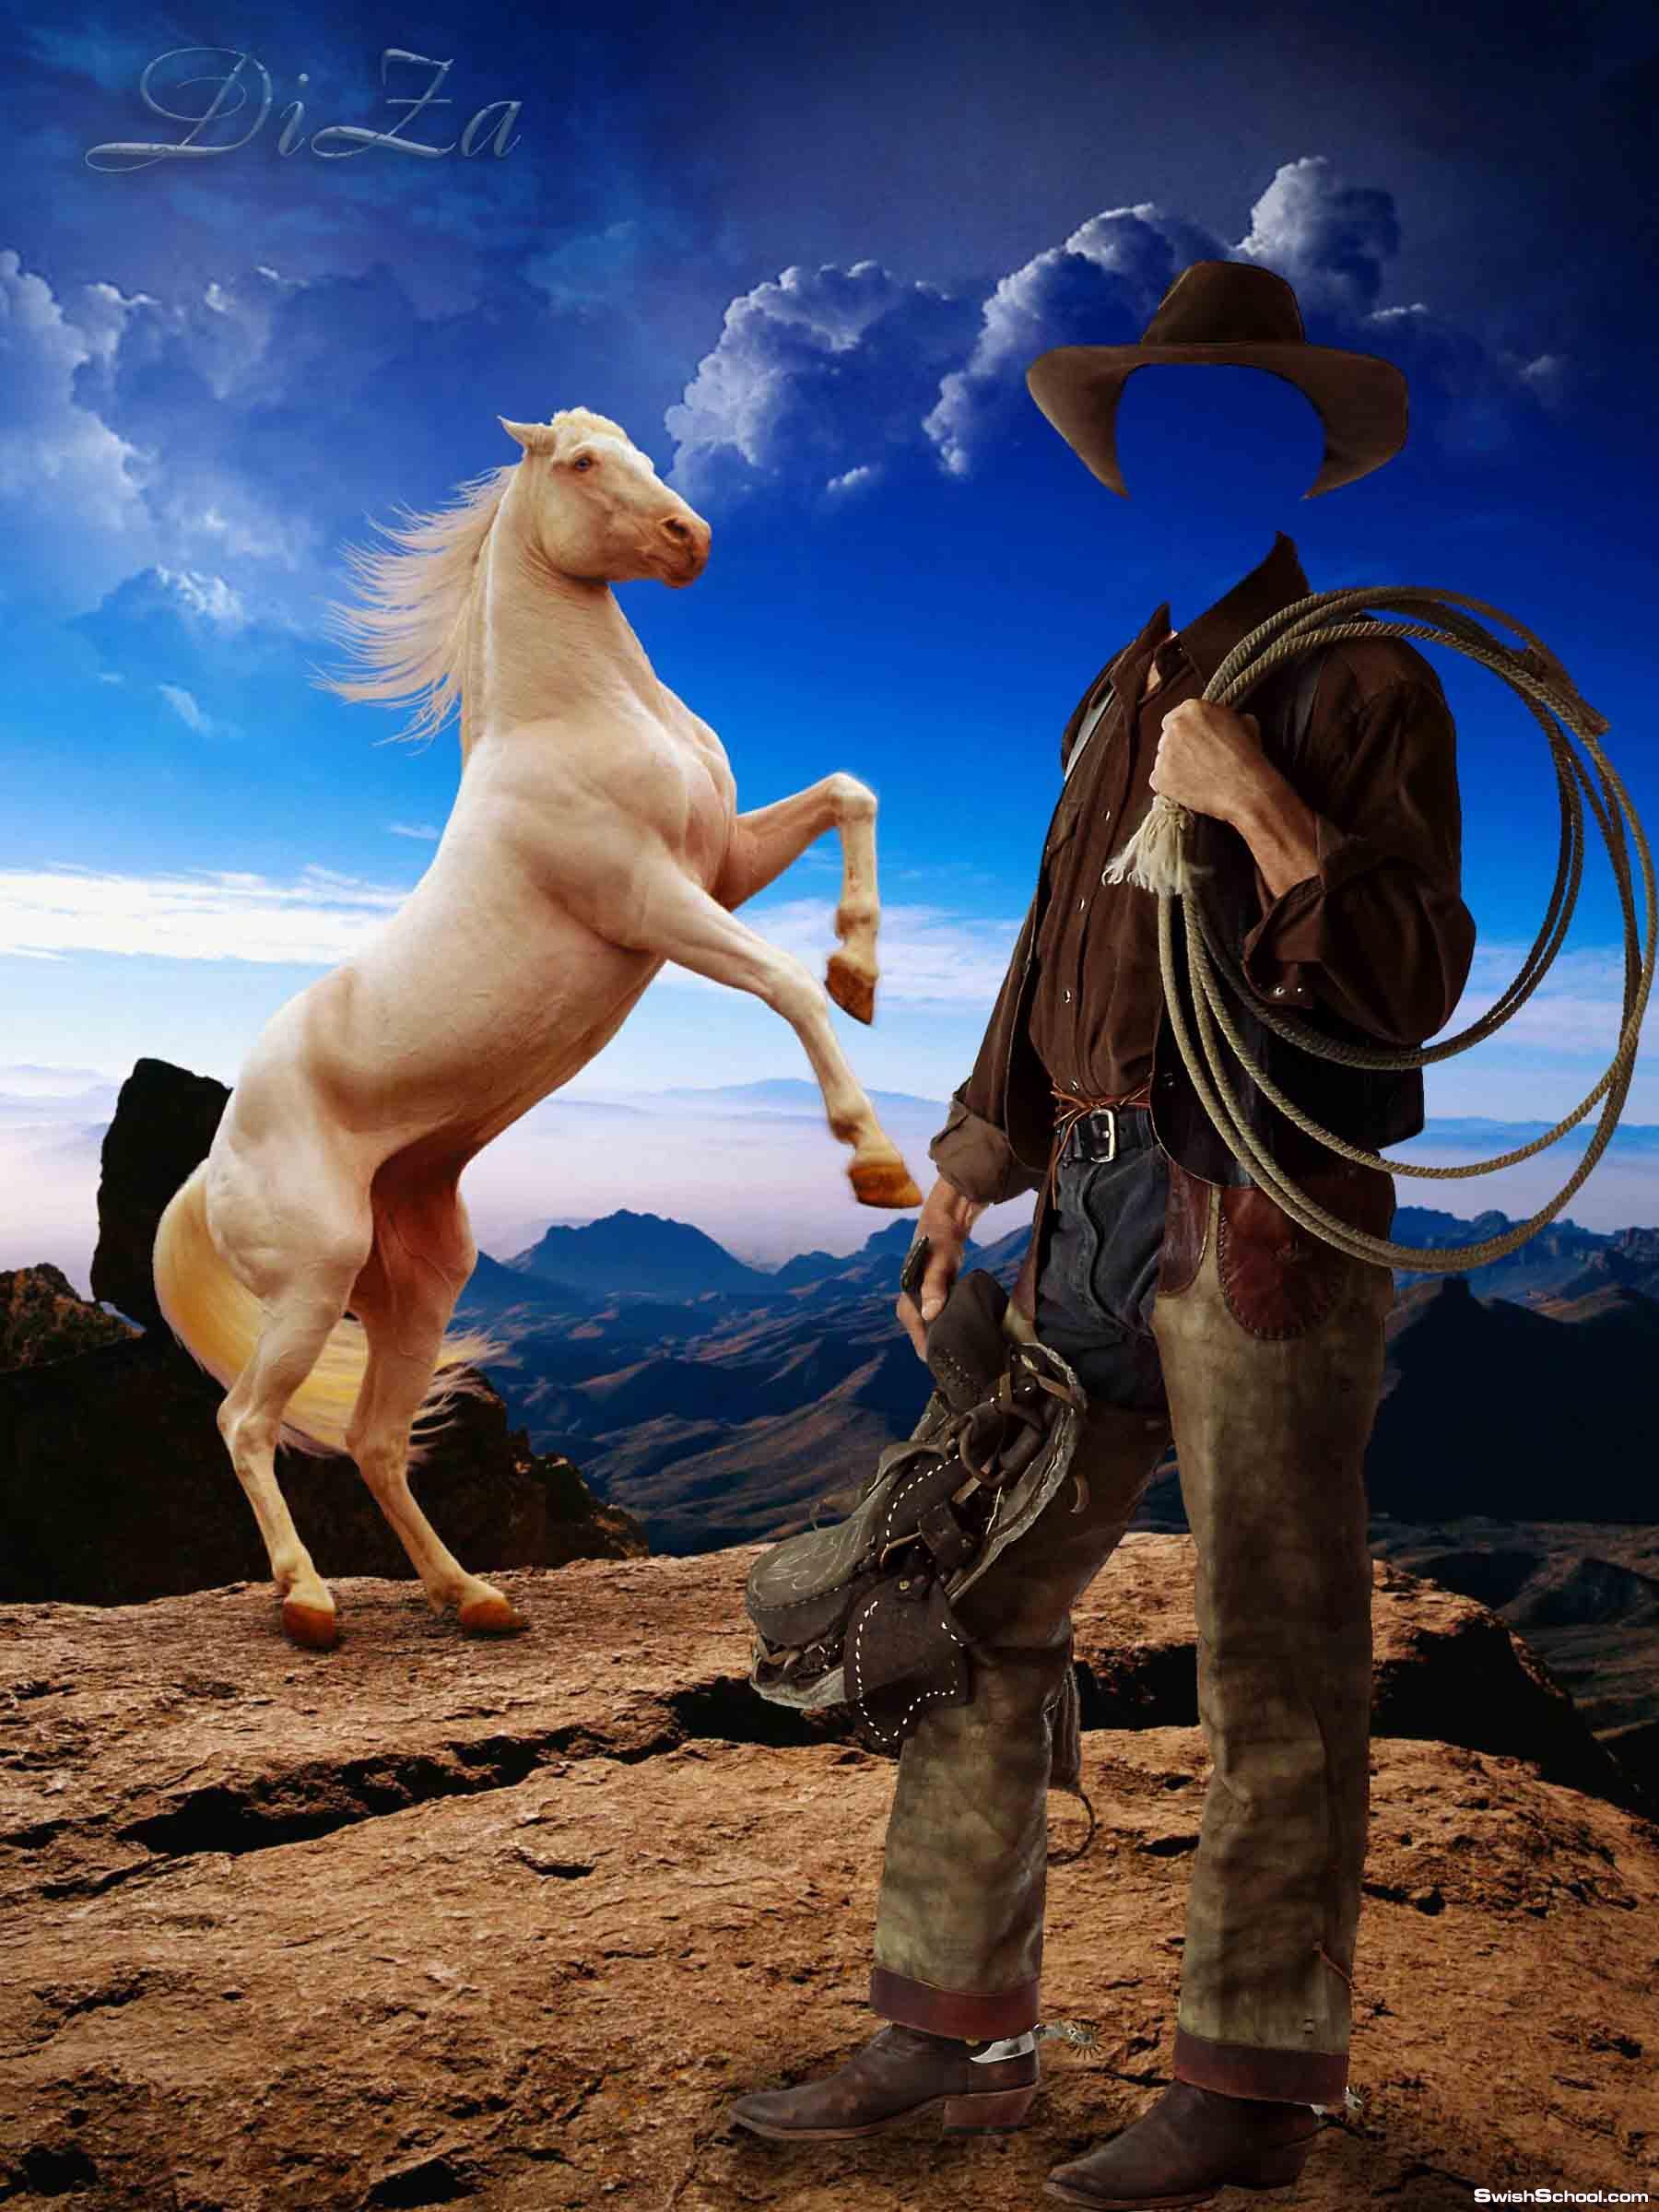 قالب ل cow boy بجانبه حصان